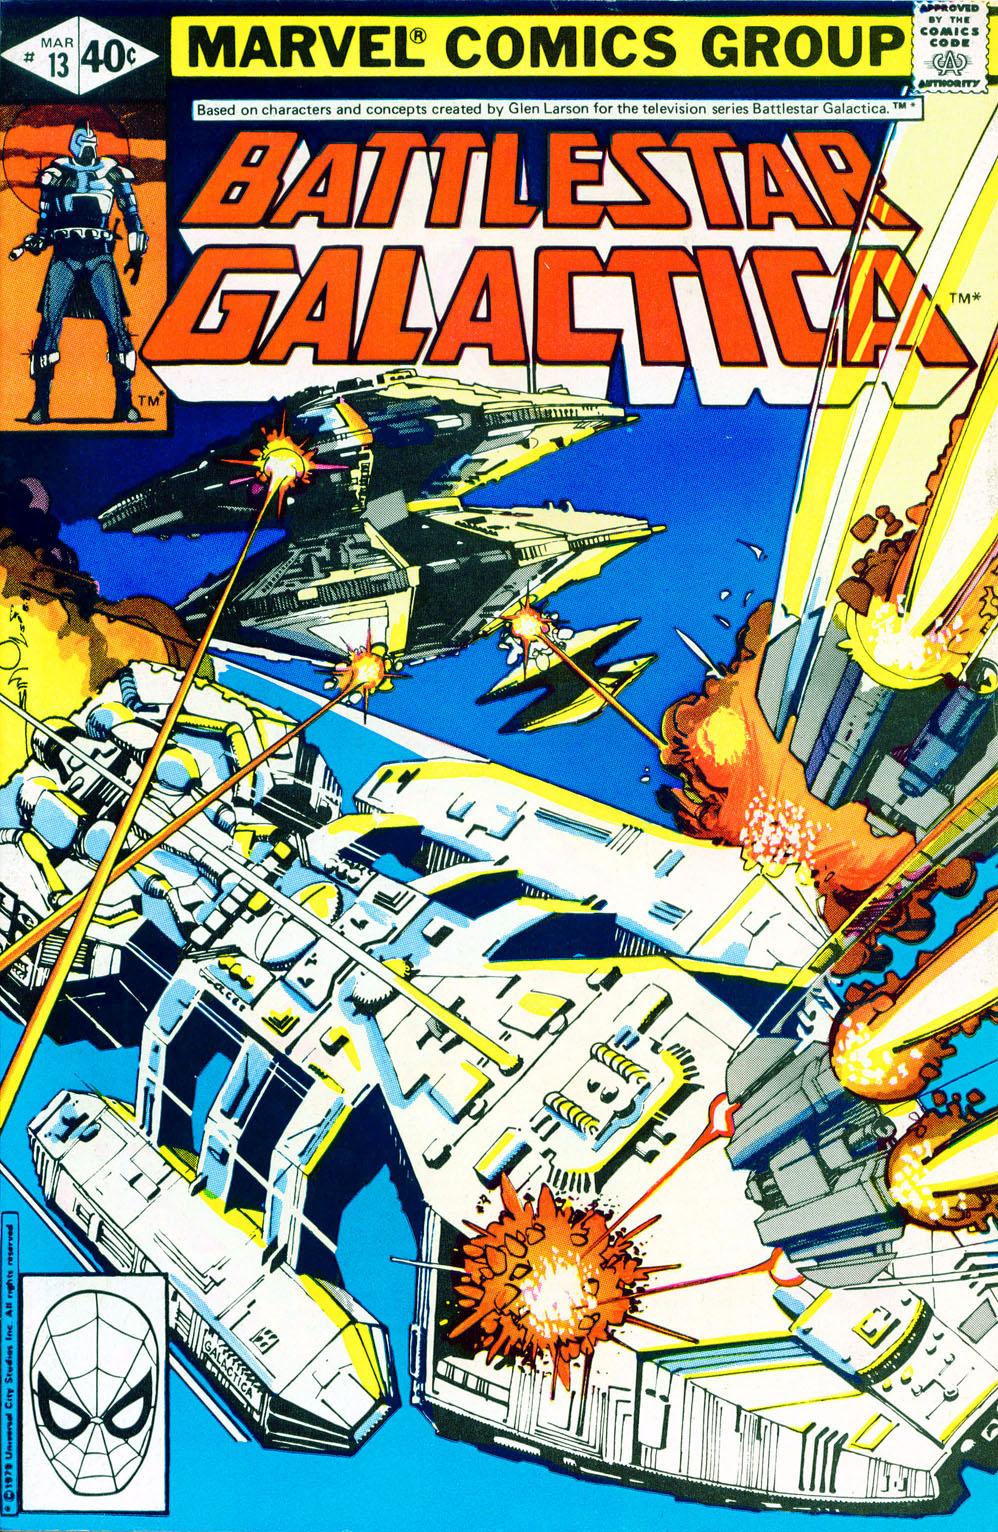 Battlestar Galactica 13 Page 1